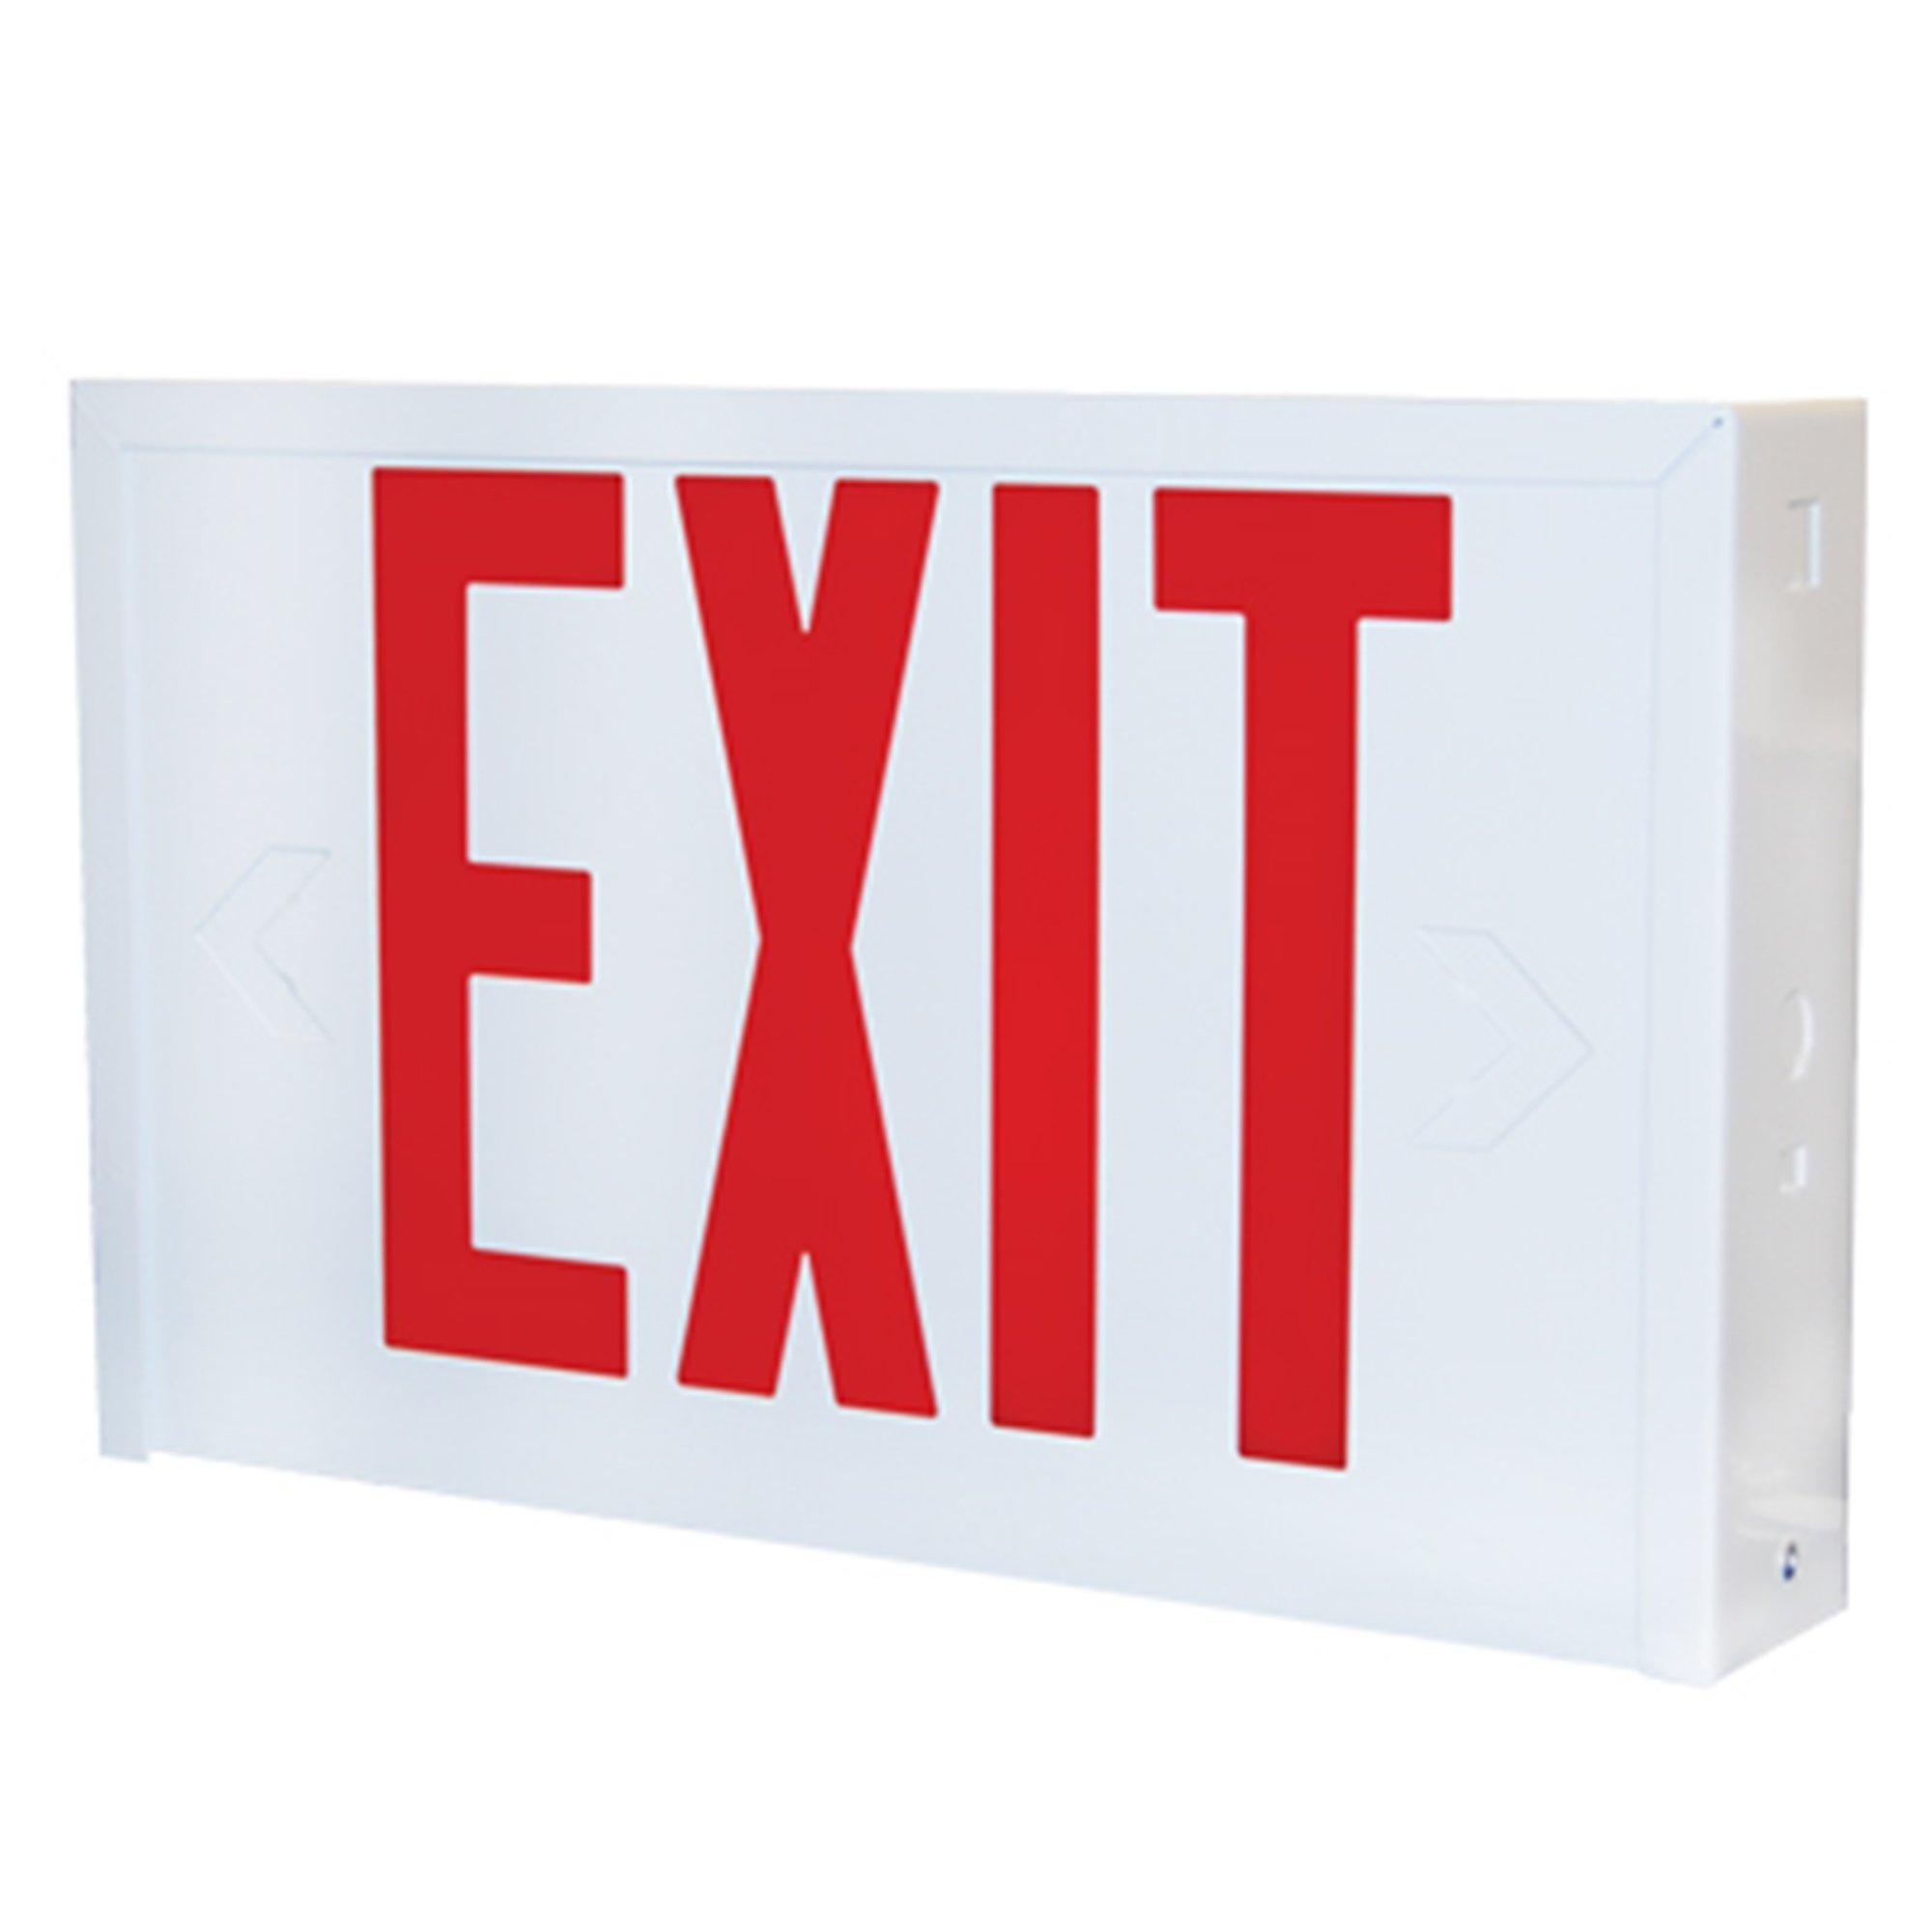 Lithonia Lighting LX W 3 R EL N Titan Steel White LED Emergency Exit Sign